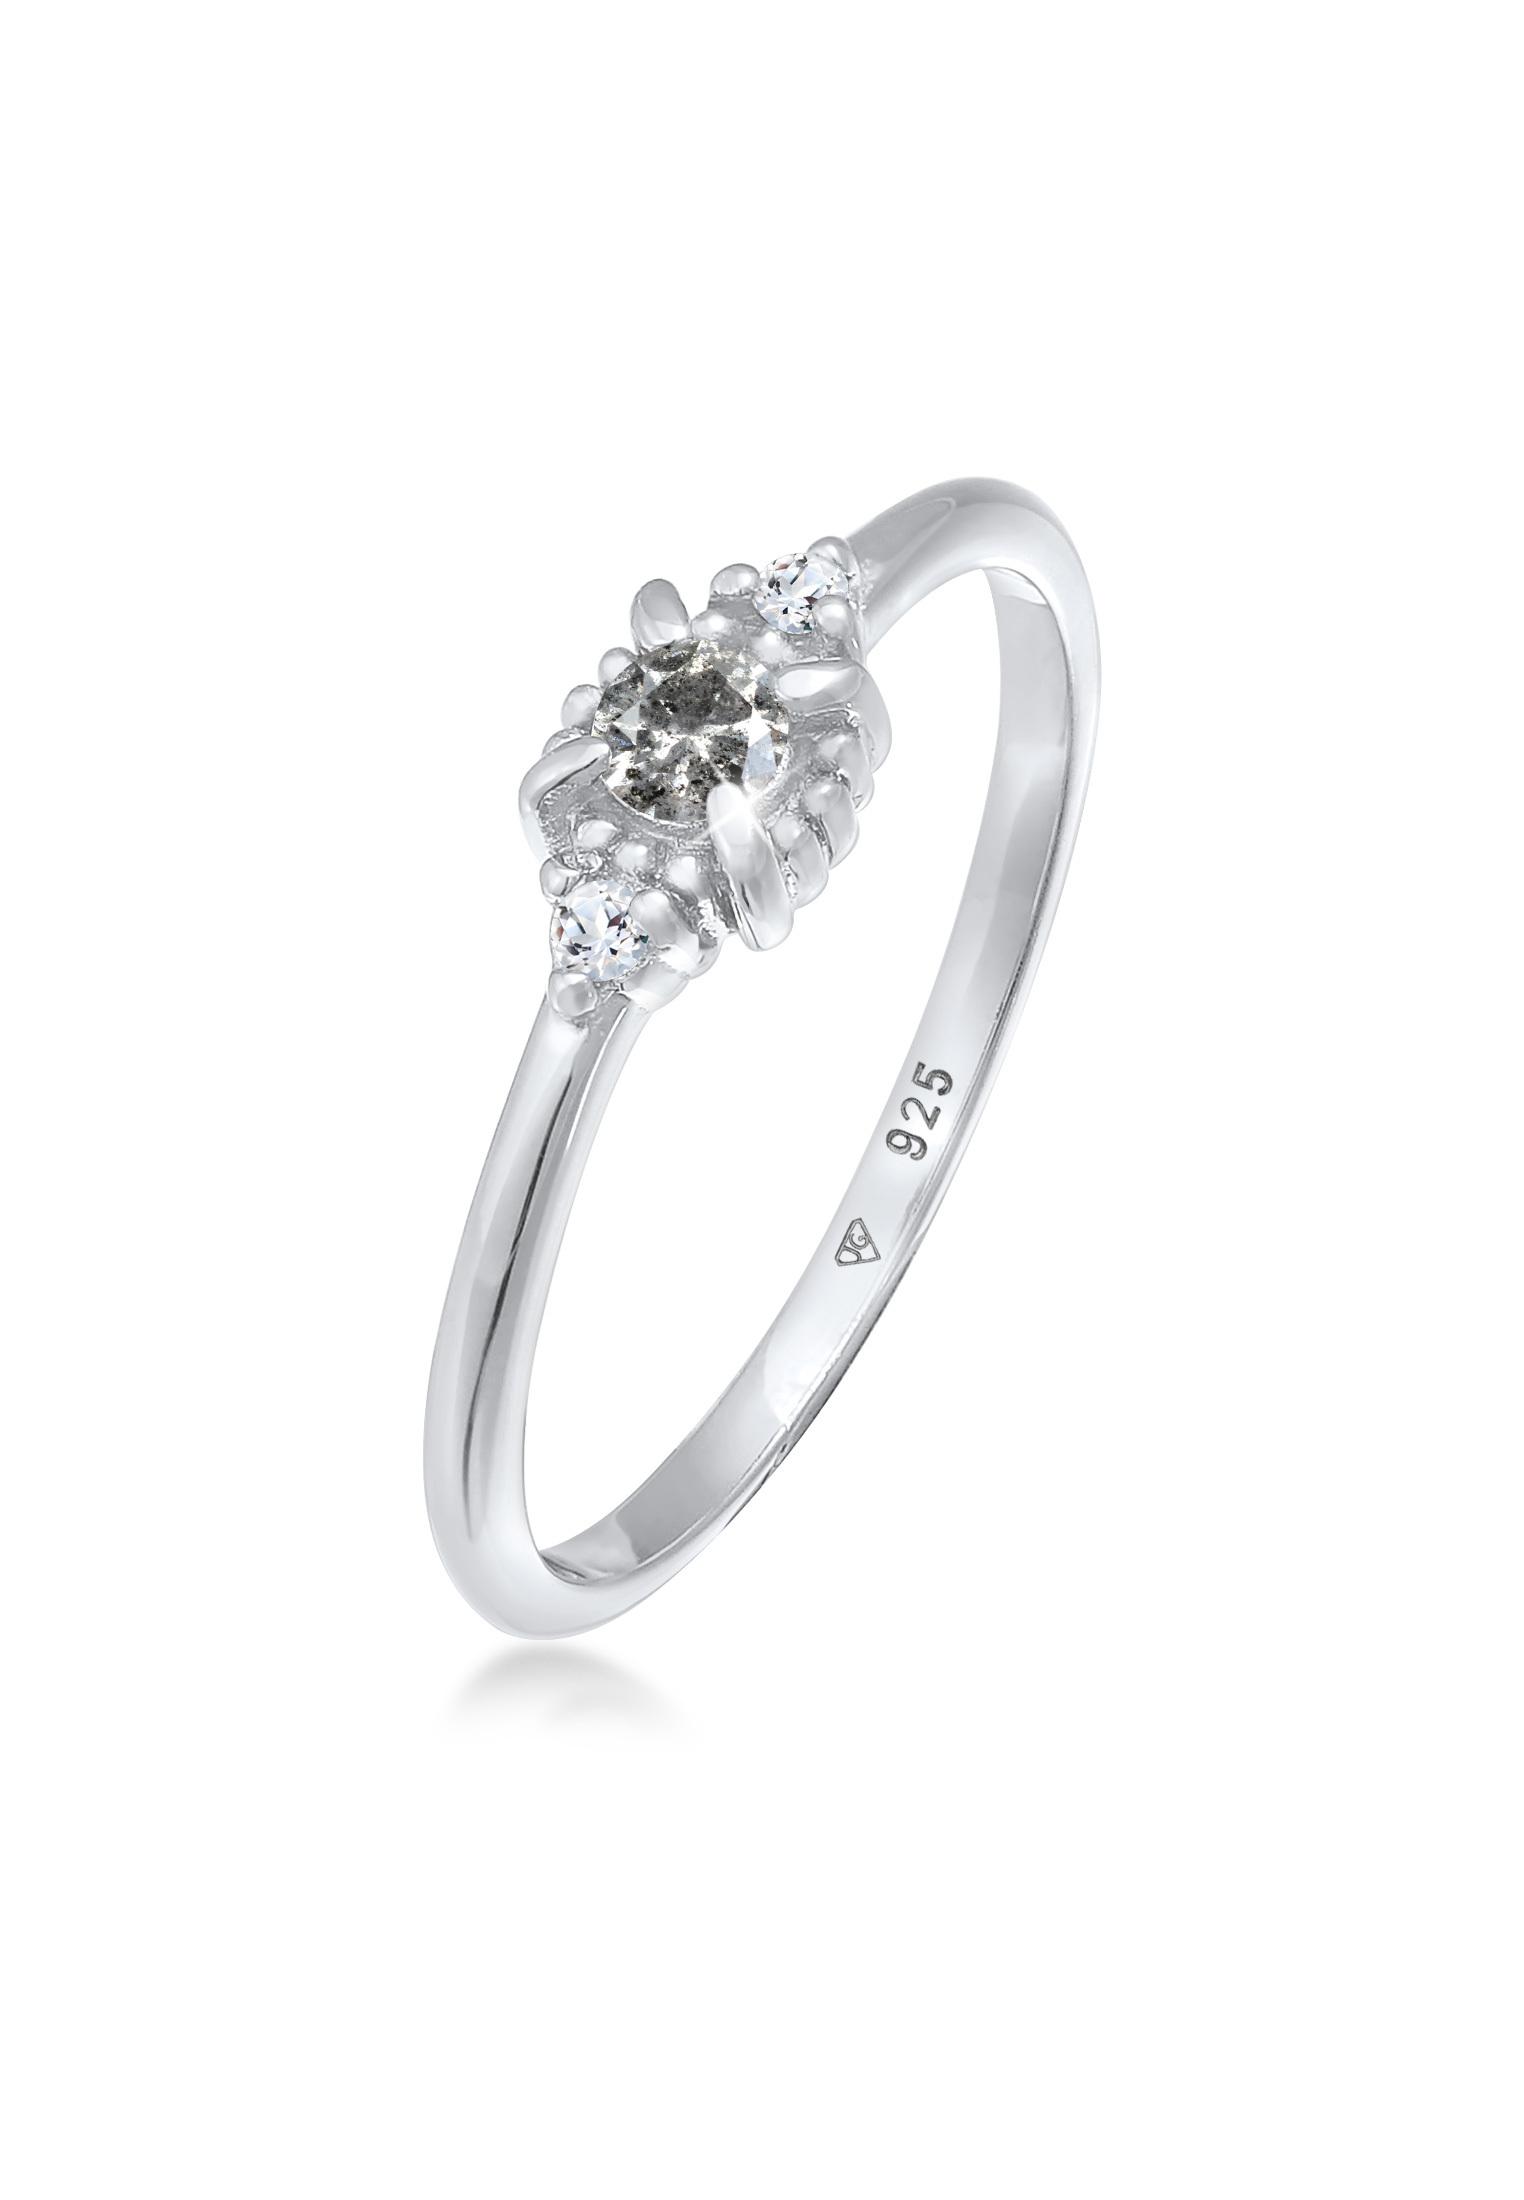 Verlobungsring | Salt & Pepper Diamant (0.11 ct.), Topas (weiß) | 925er Sterling Silber